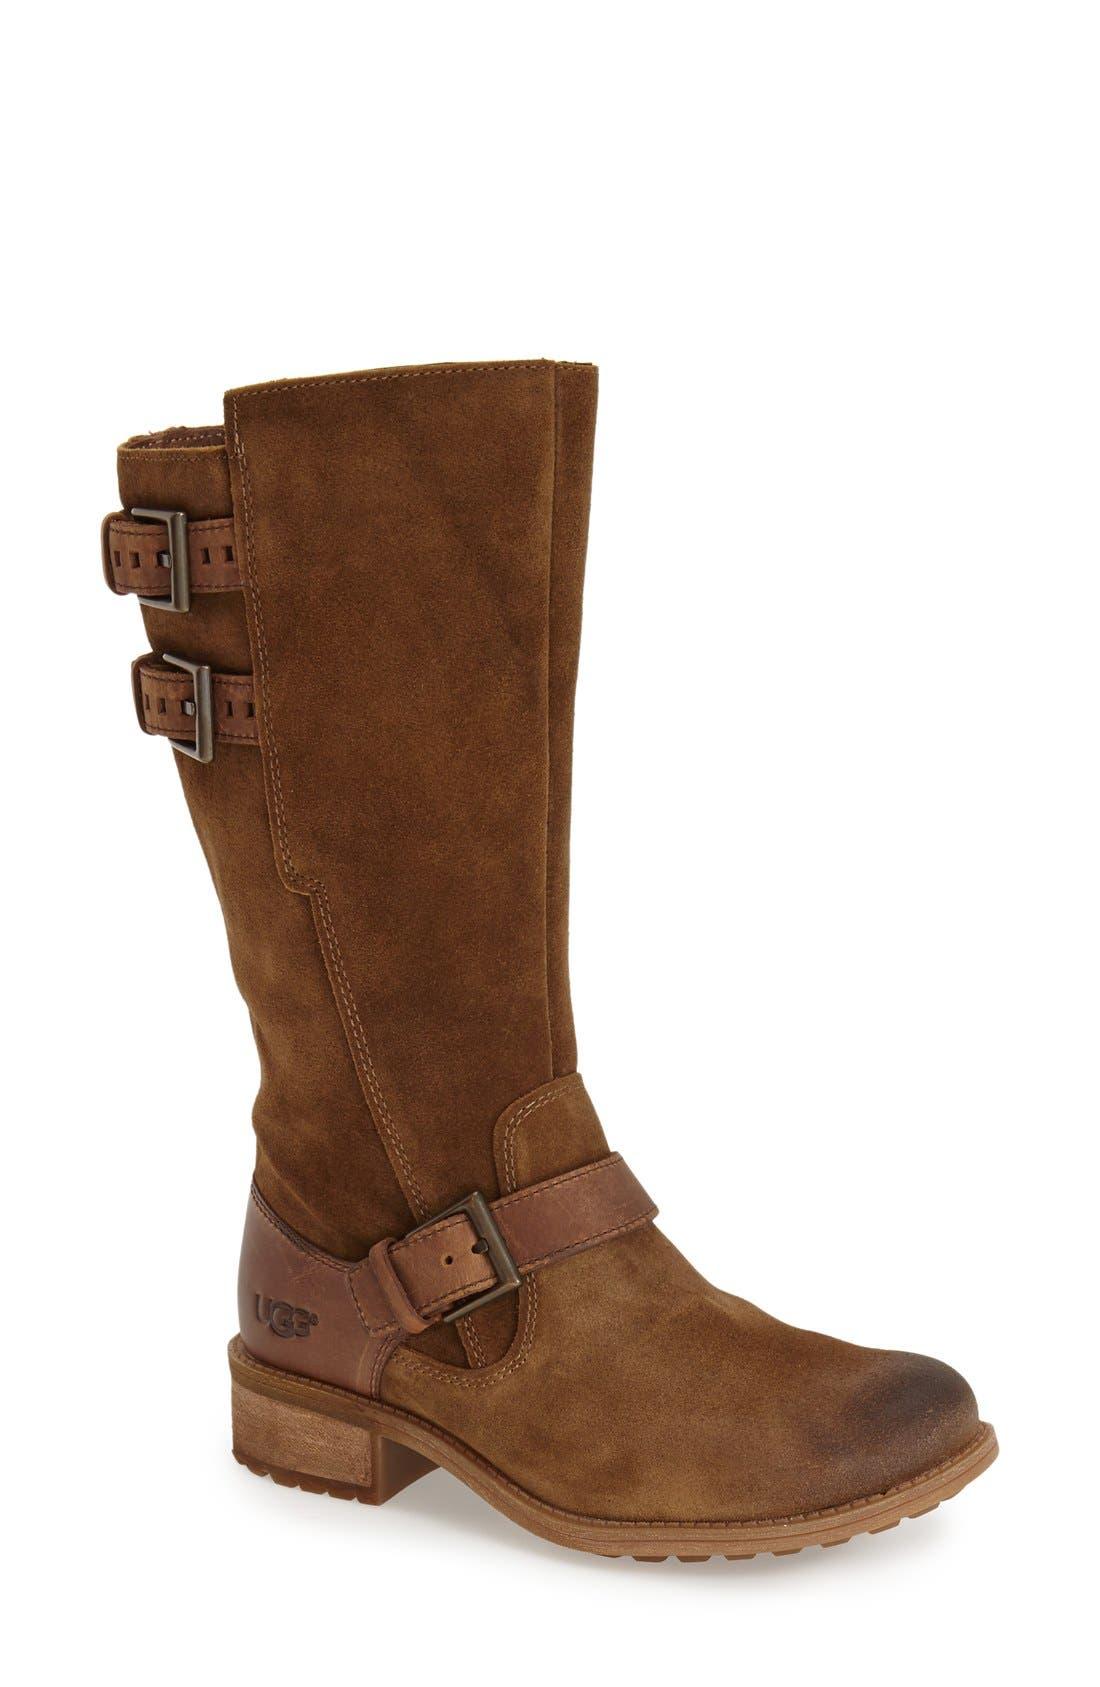 Alternate Image 1 Selected - UGG Australia® 'Everglayde' Tall Boot (Women)